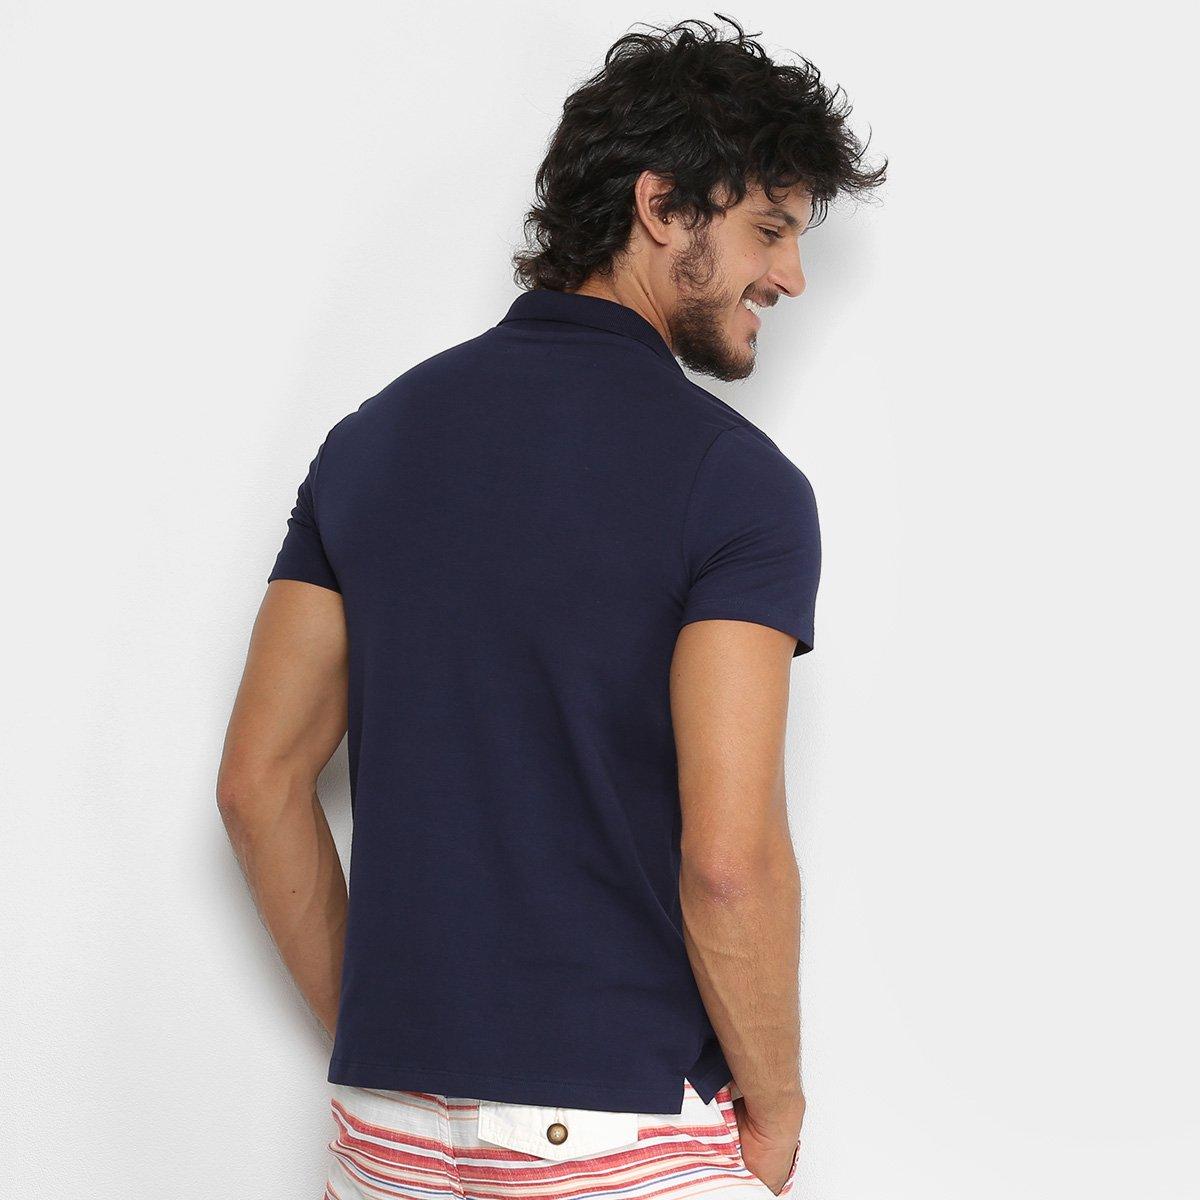 53a19ea634 Camisa Polo Kohmar Básica Masculina  Camisa Polo Kohmar Básica Masculina ...